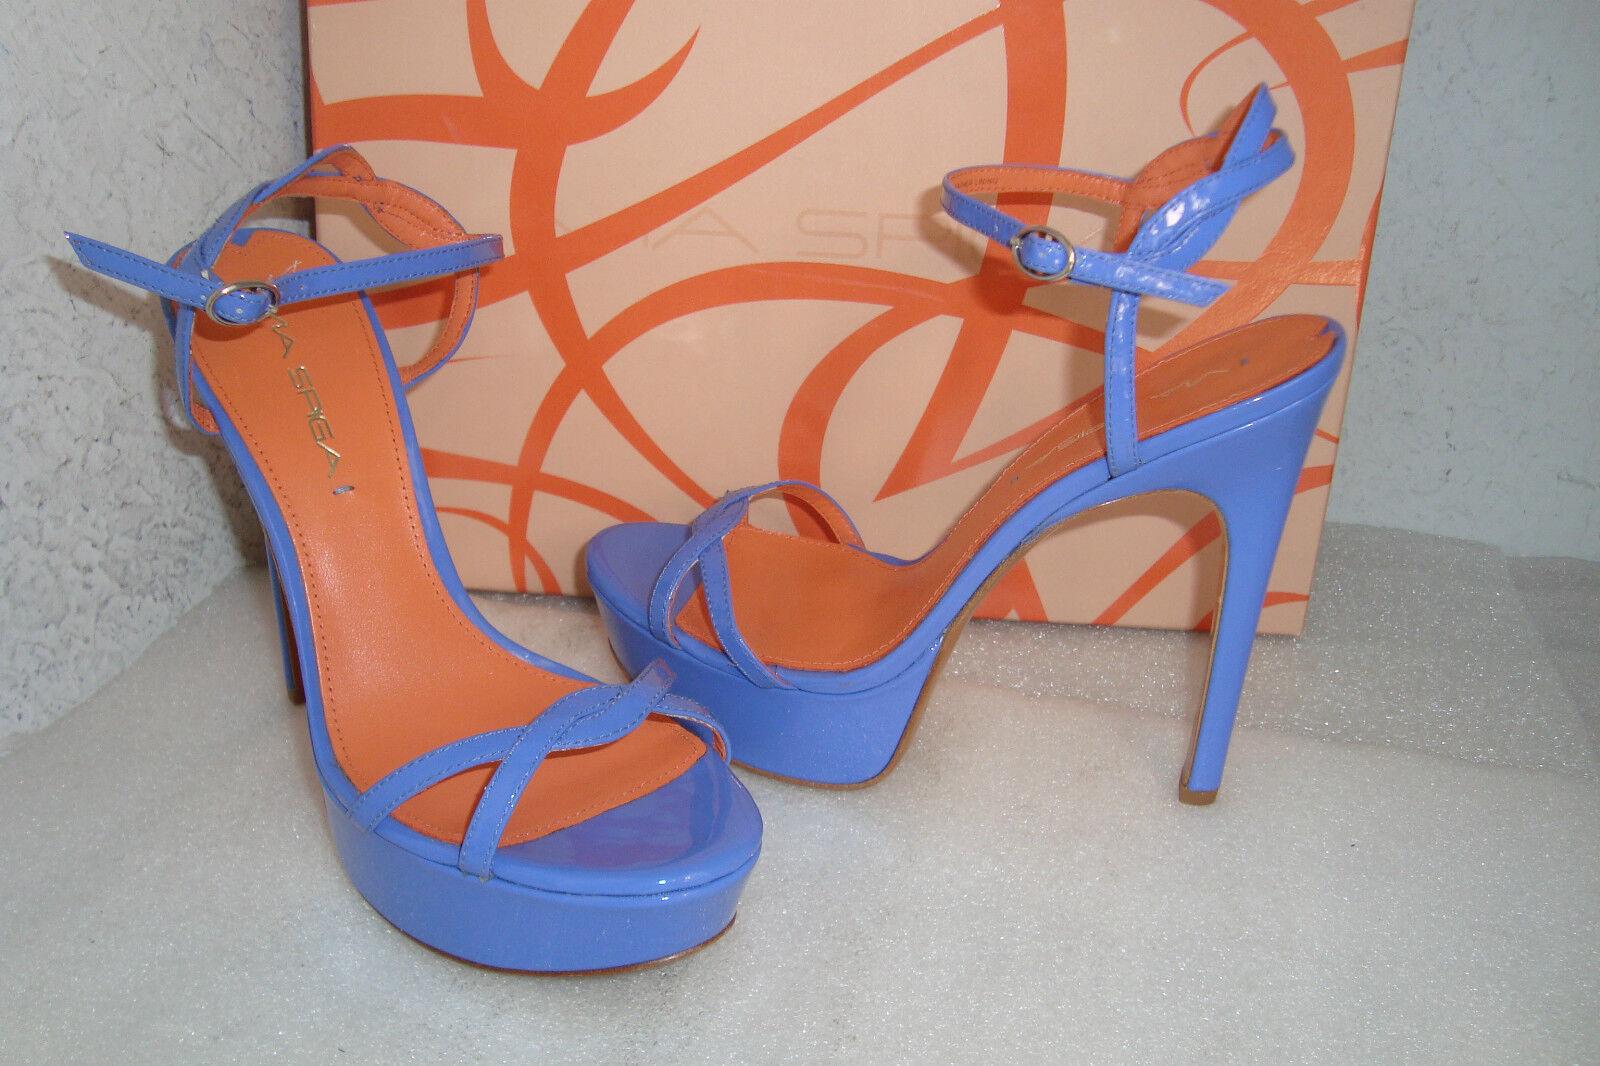 Via Spiga Damenschuhe NWB Heavenly Periw Patent Blau Sandales Schuhes 6 MED NEU